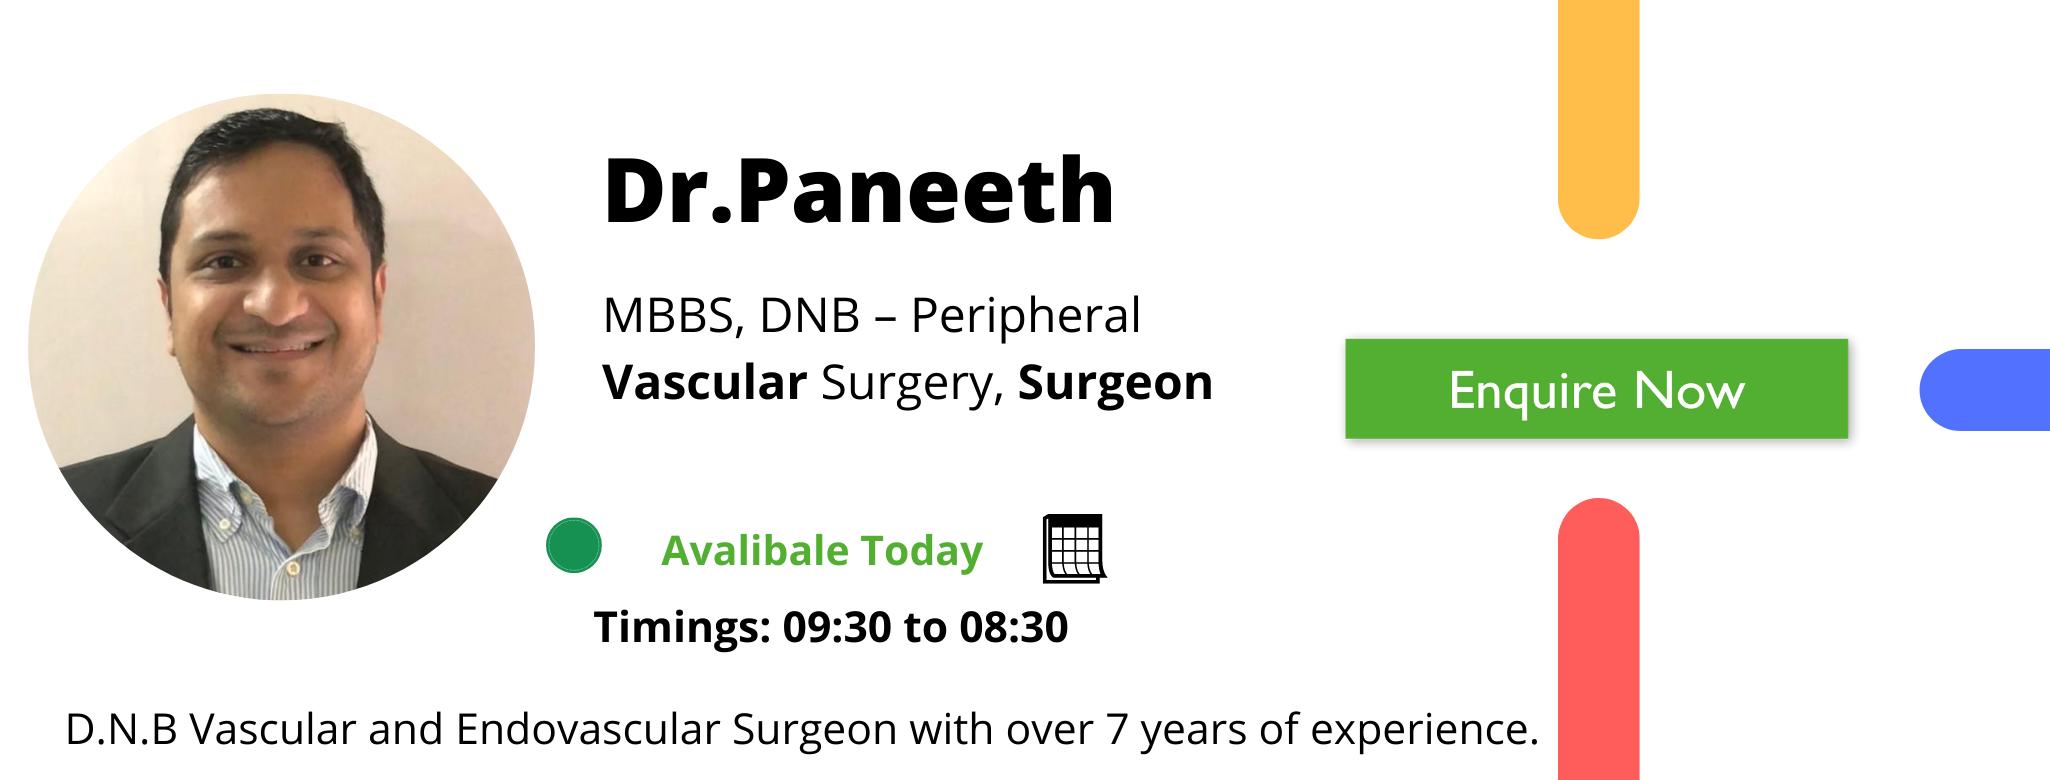 Dr.Paneeth Varicose veins